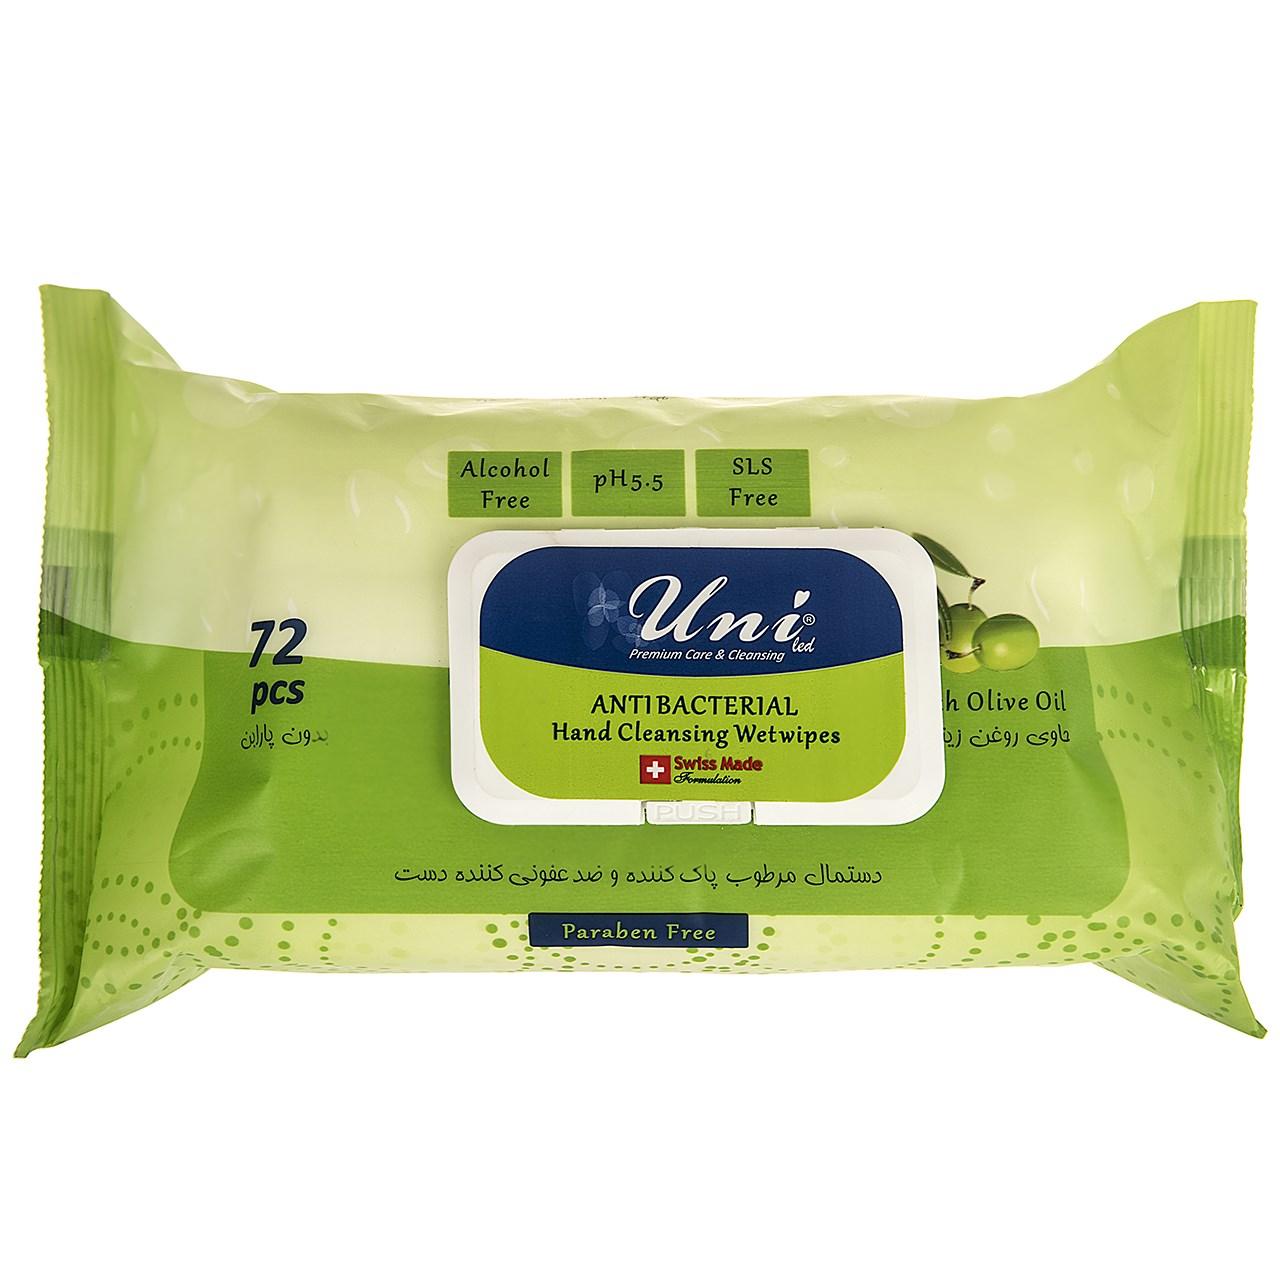 قیمت دستمال مرطوب یونی لد مدل Antibacterial Hand Cleansing With Olive Oil بسته 72 عددی